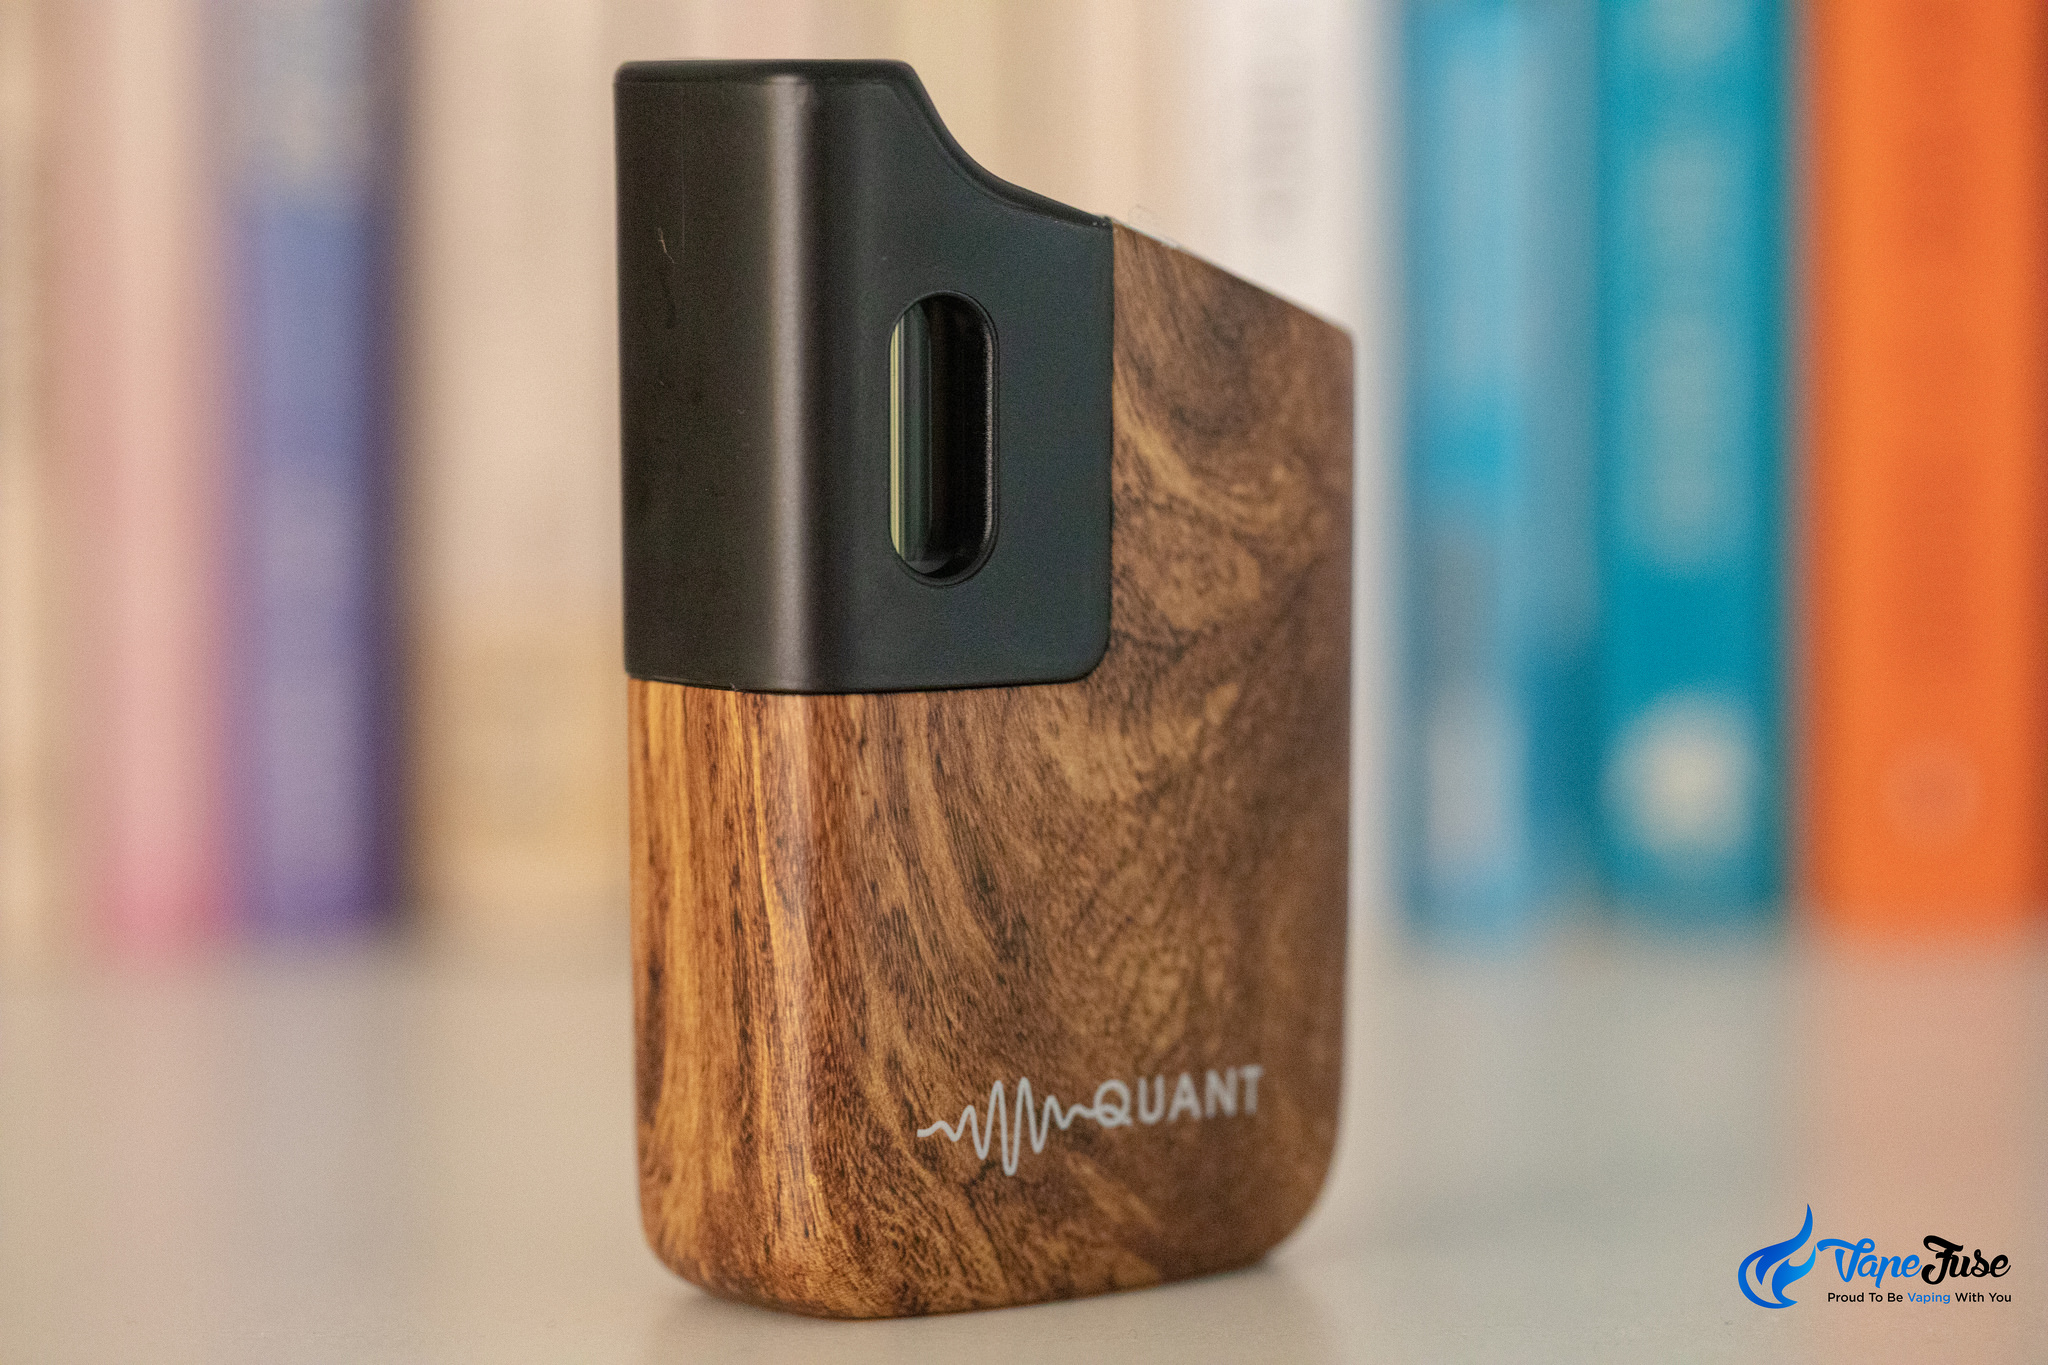 Sneak Peek: Quant Vaporizer Premium 3 in 1 Portable